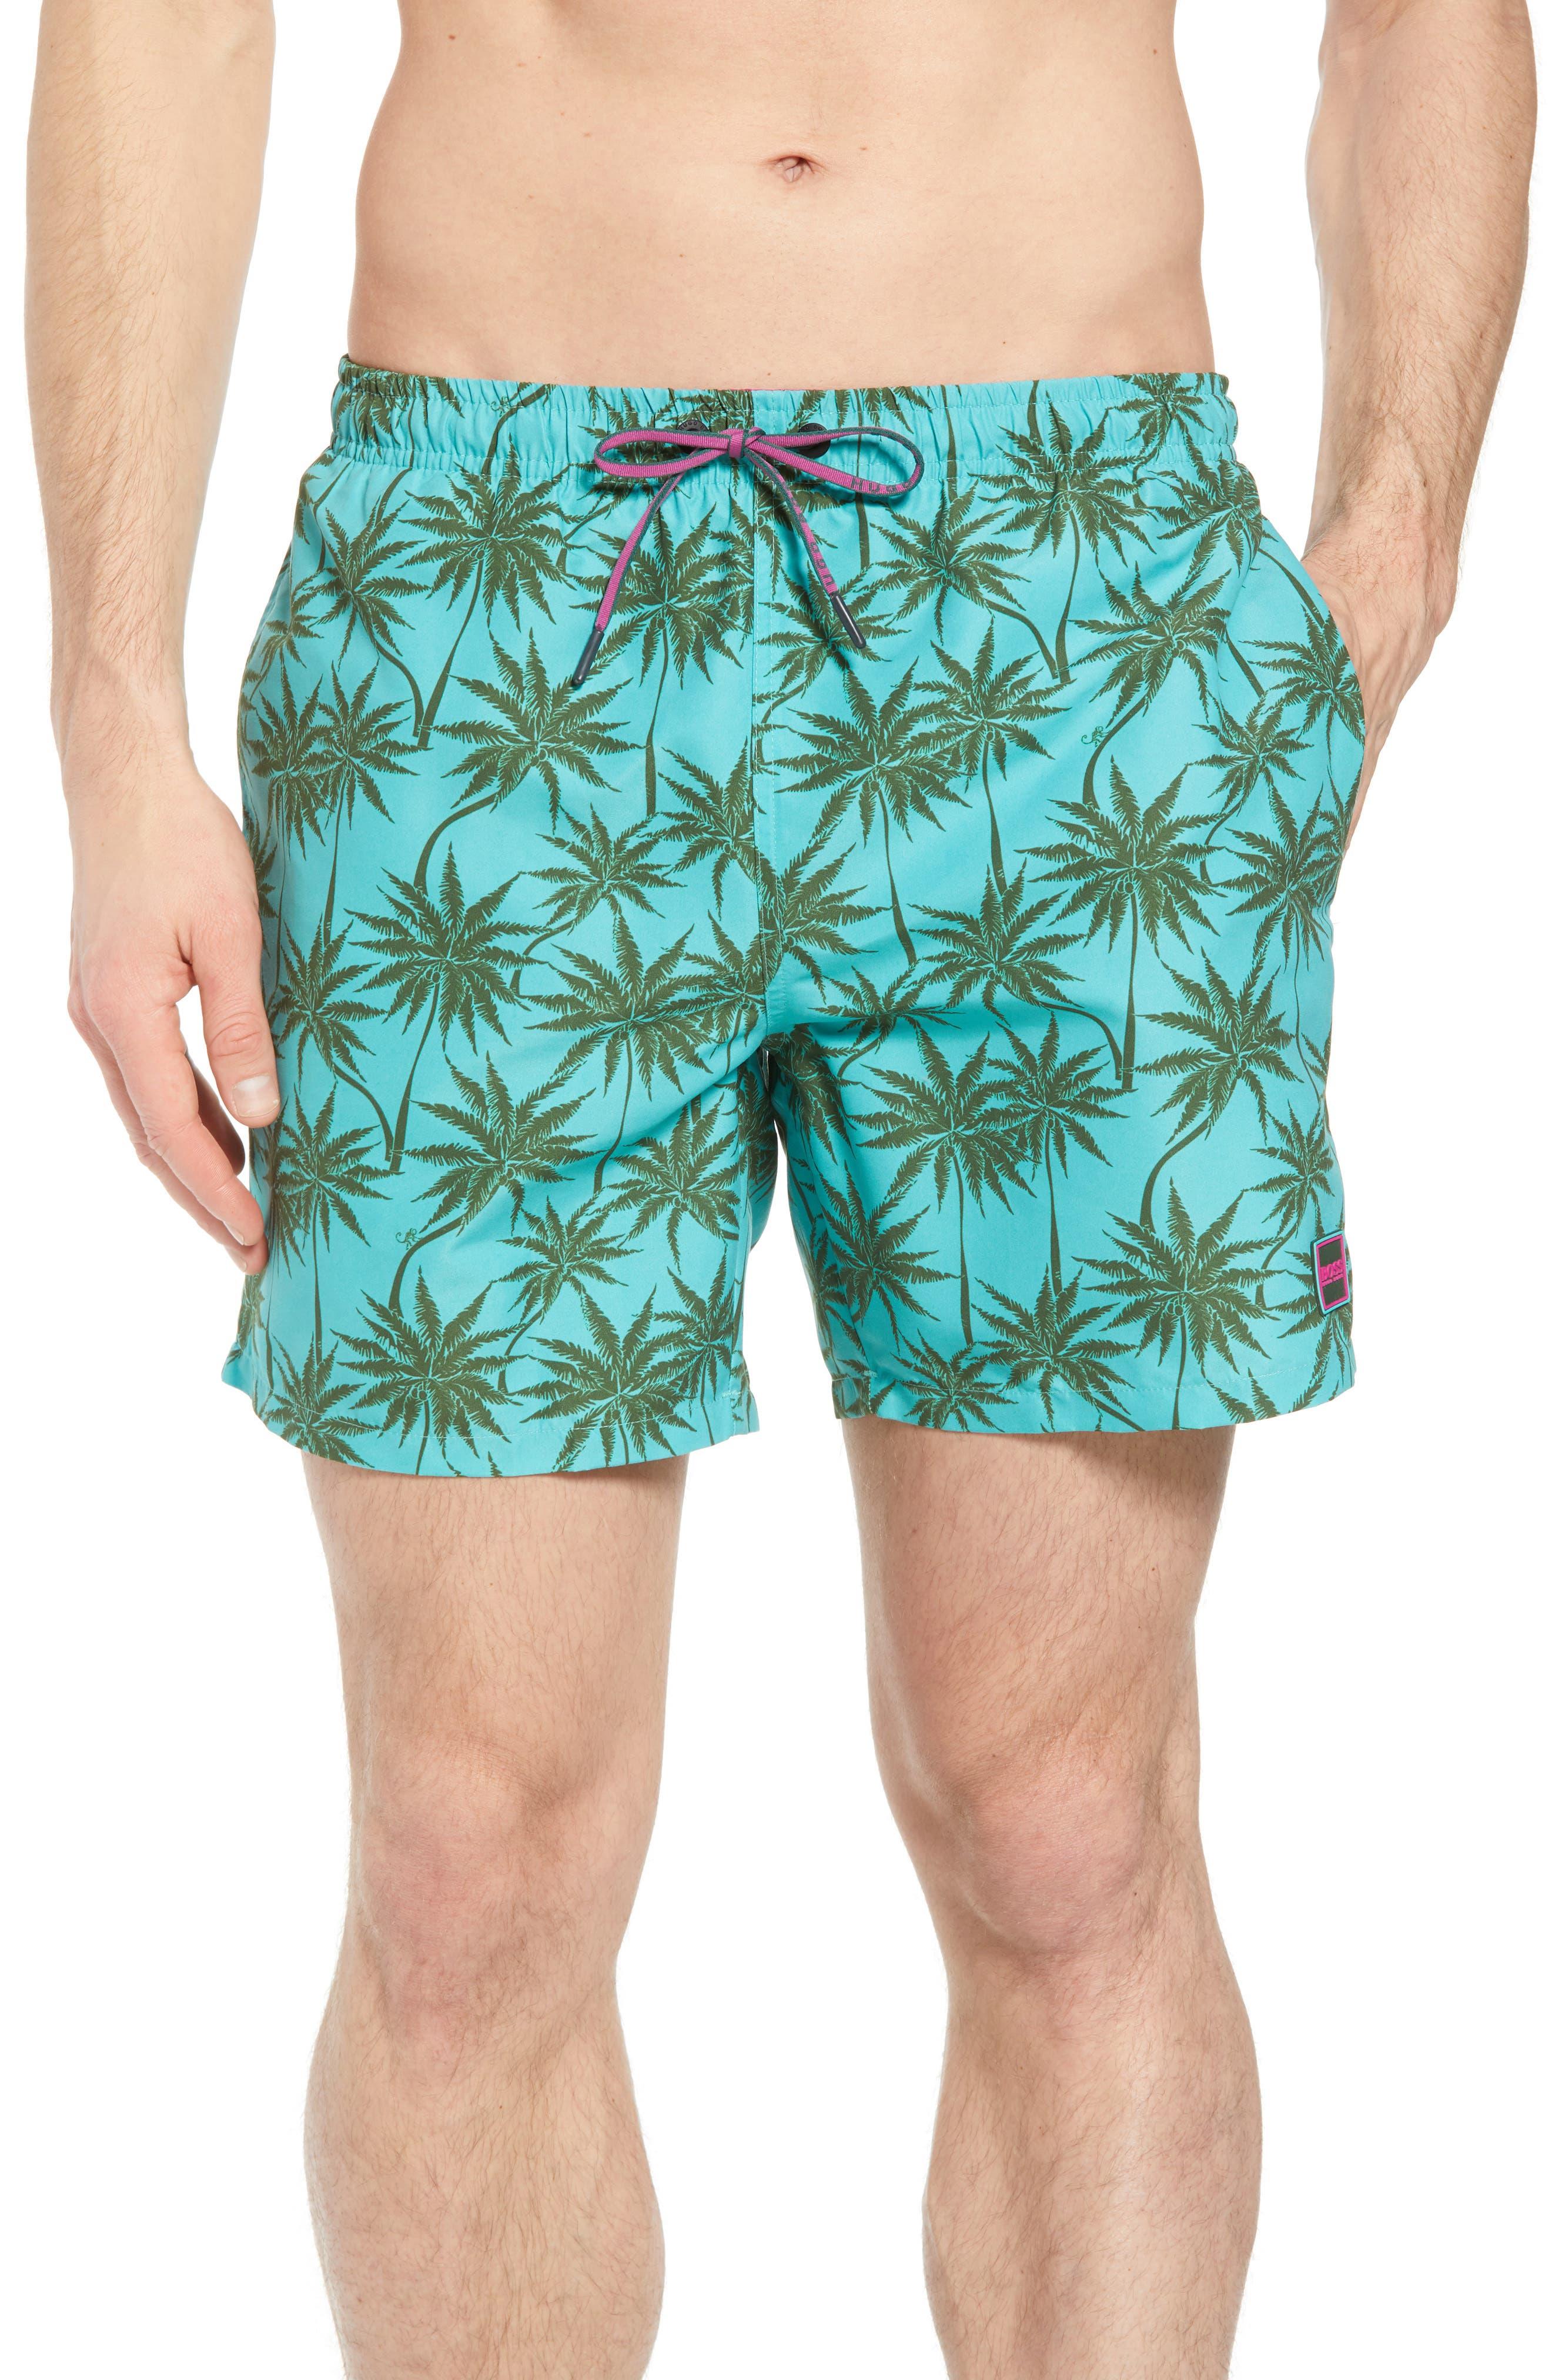 Piranha Palm Tree Swim Trunks,                             Main thumbnail 1, color,                             483